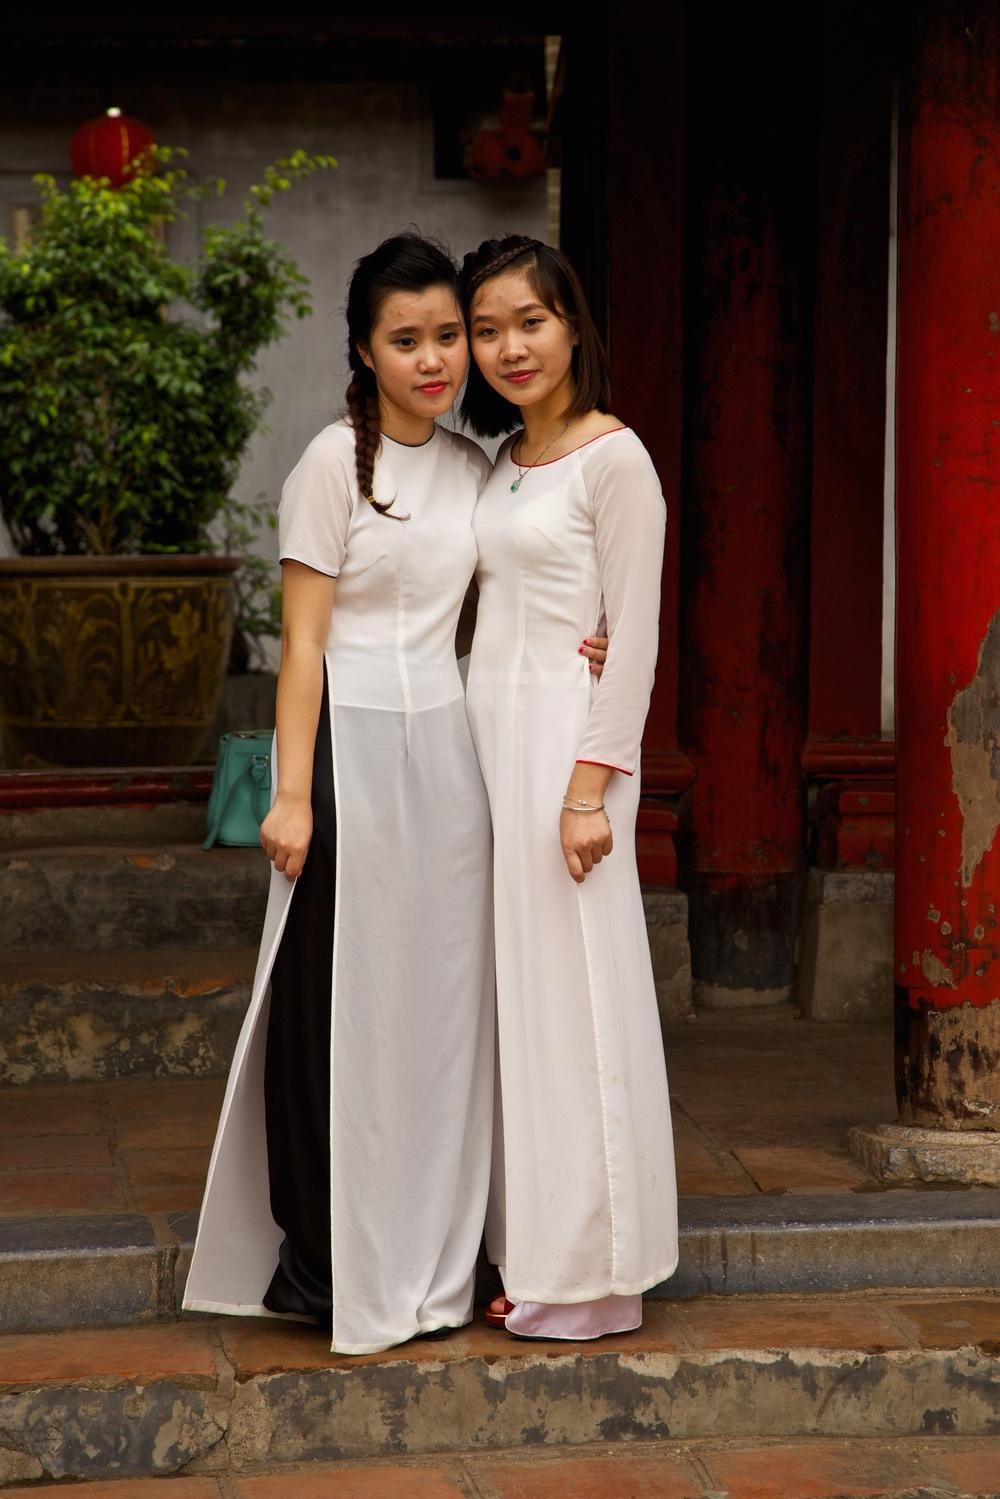 Friends visiting a Vietnamese temple.